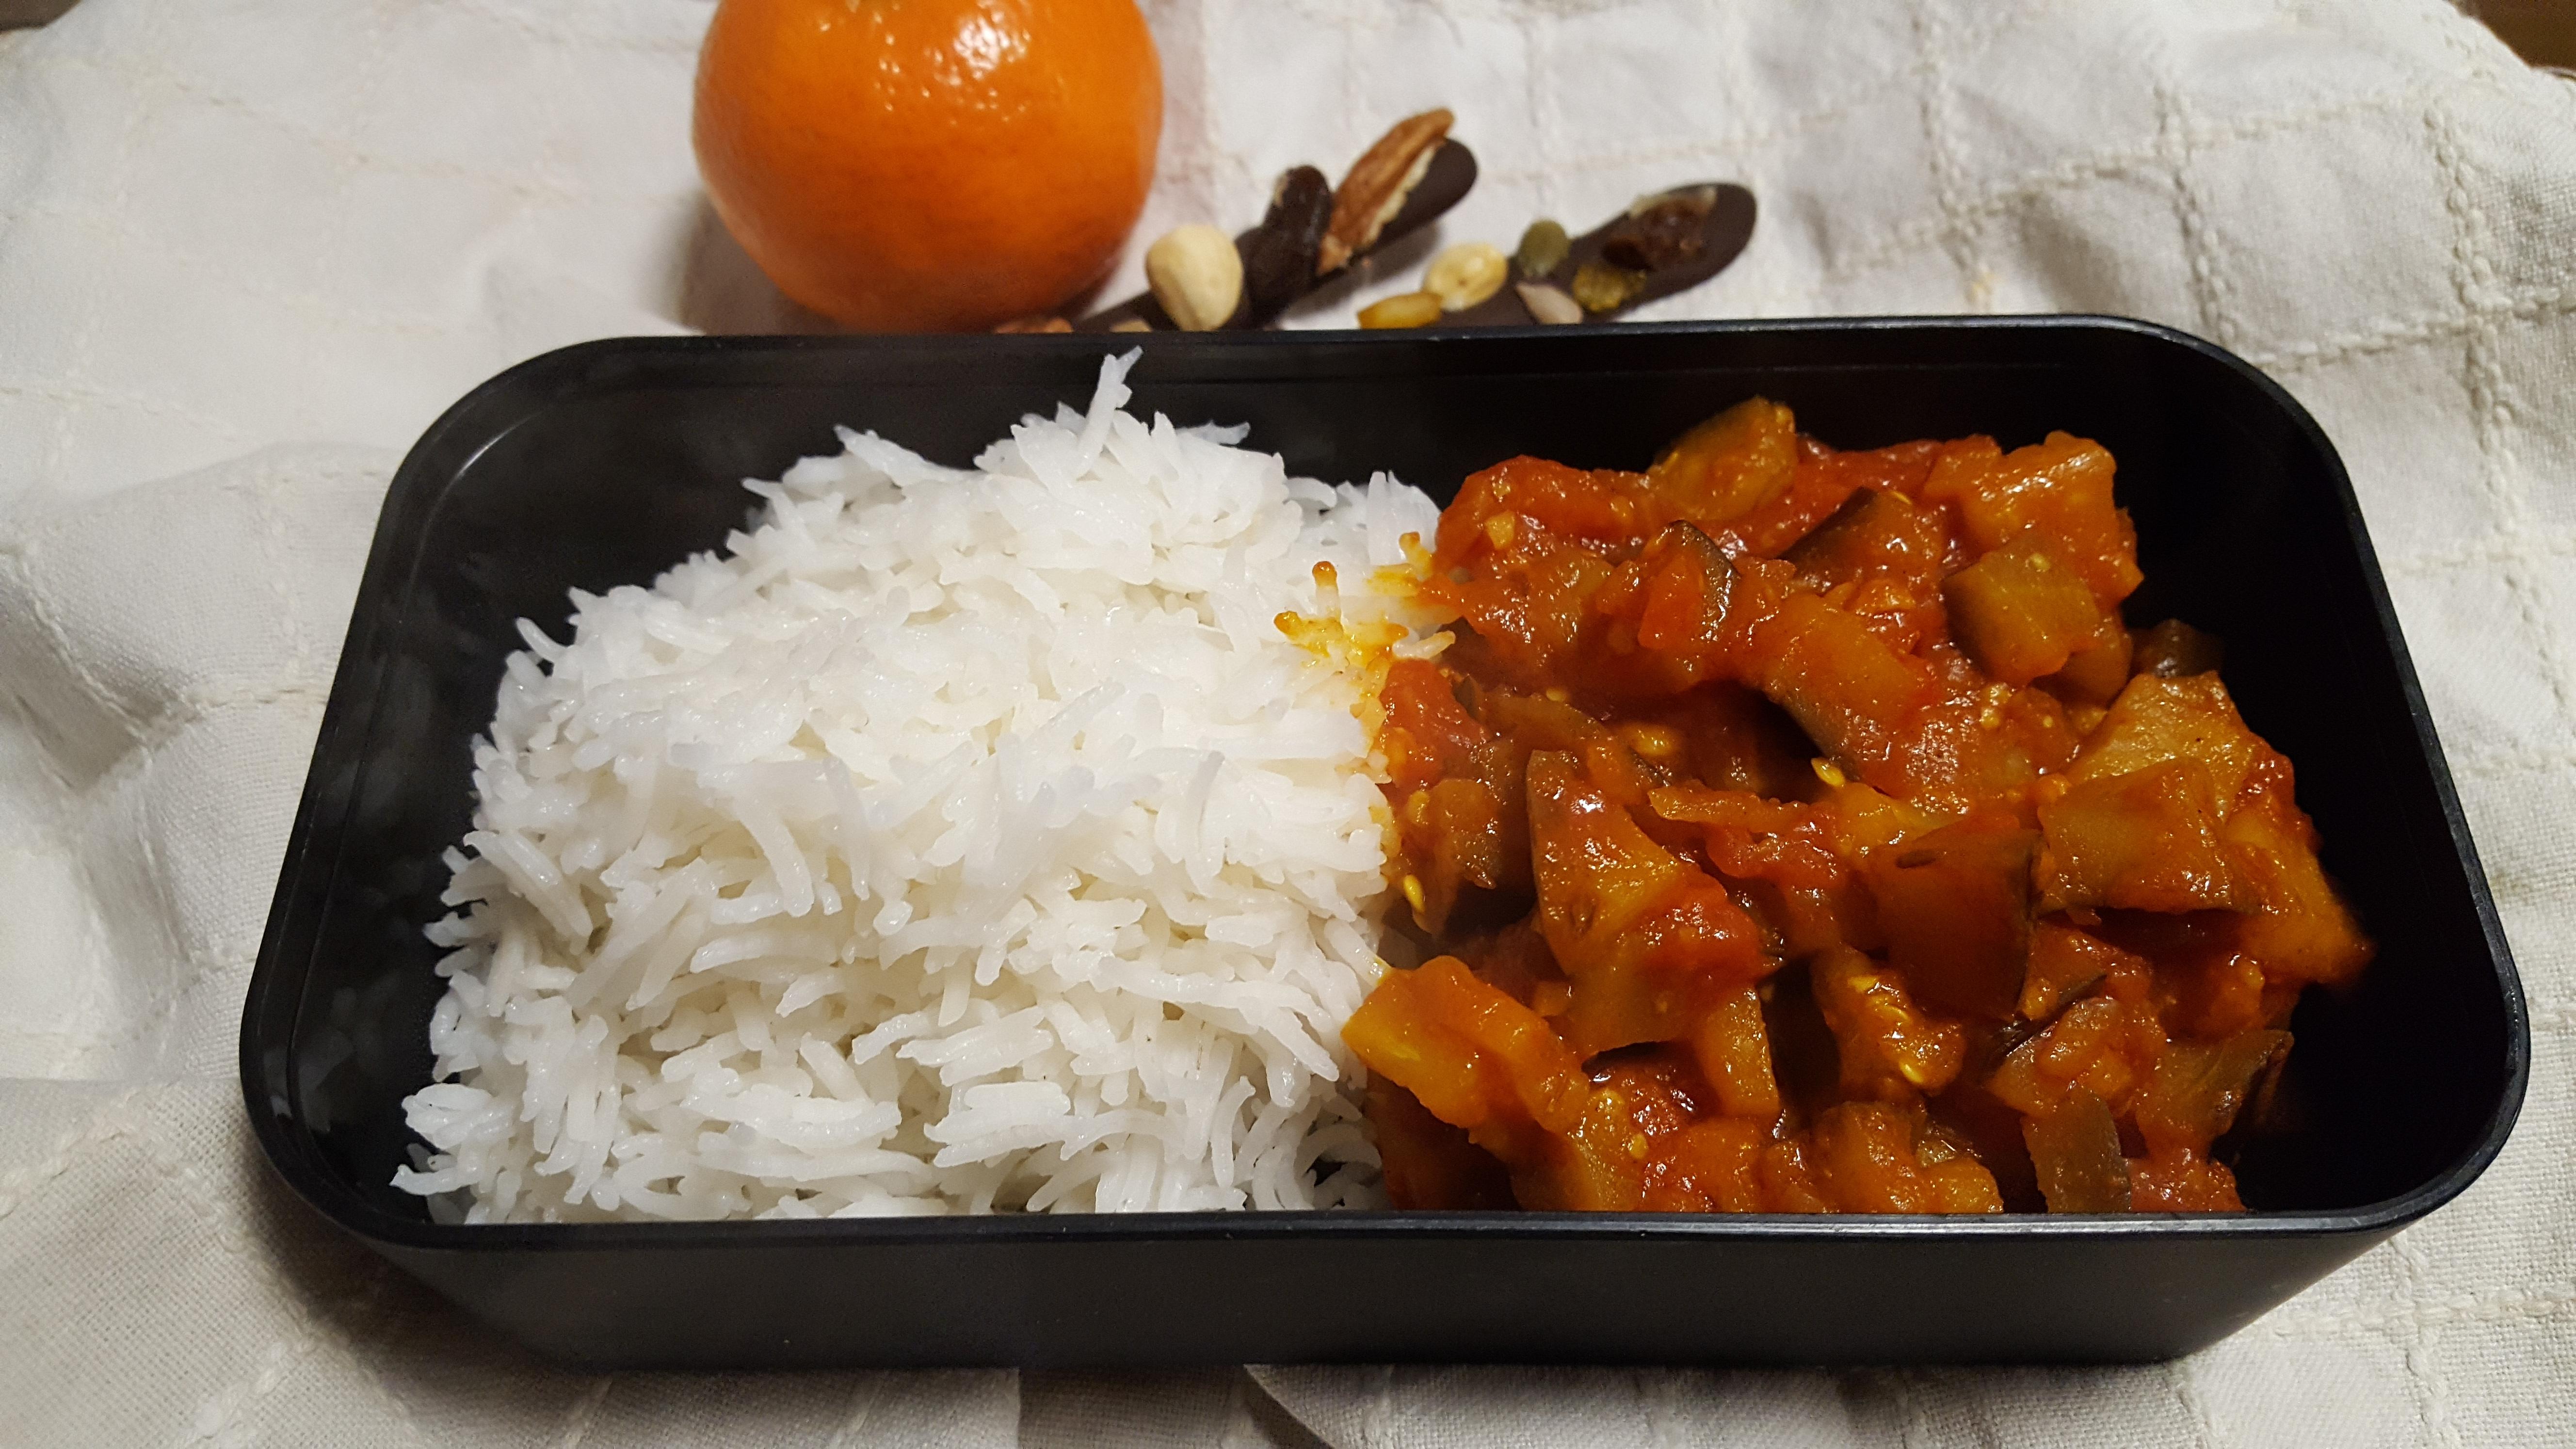 Aubergine & Tomato Stew with basmati rice - Lunch box ideas